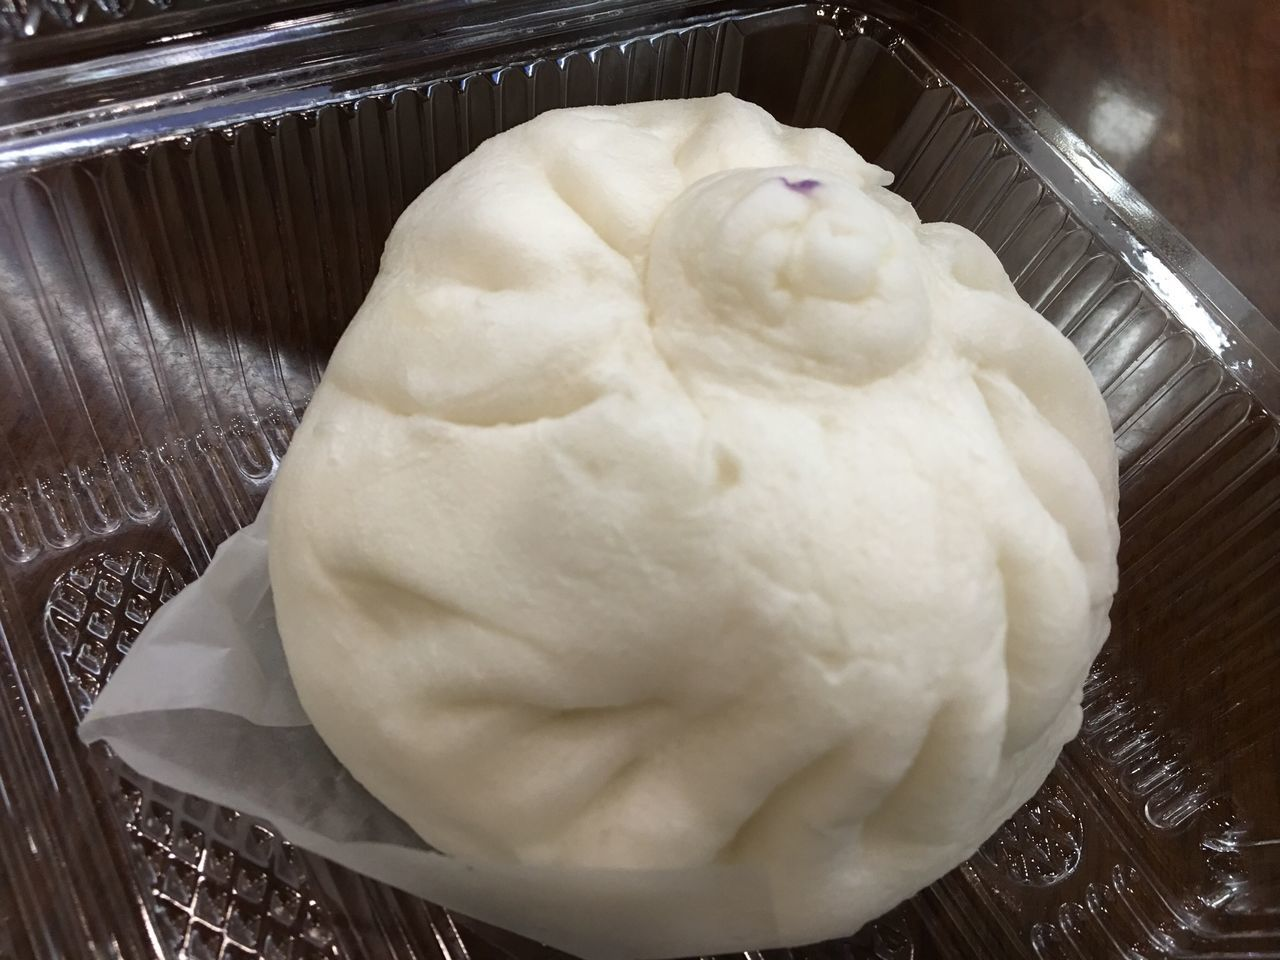 Sarabao Sara 小籠包 點心 ซาลาเปา เปาลาวา ถัวดำ Bean Bun Bun Bun Bean